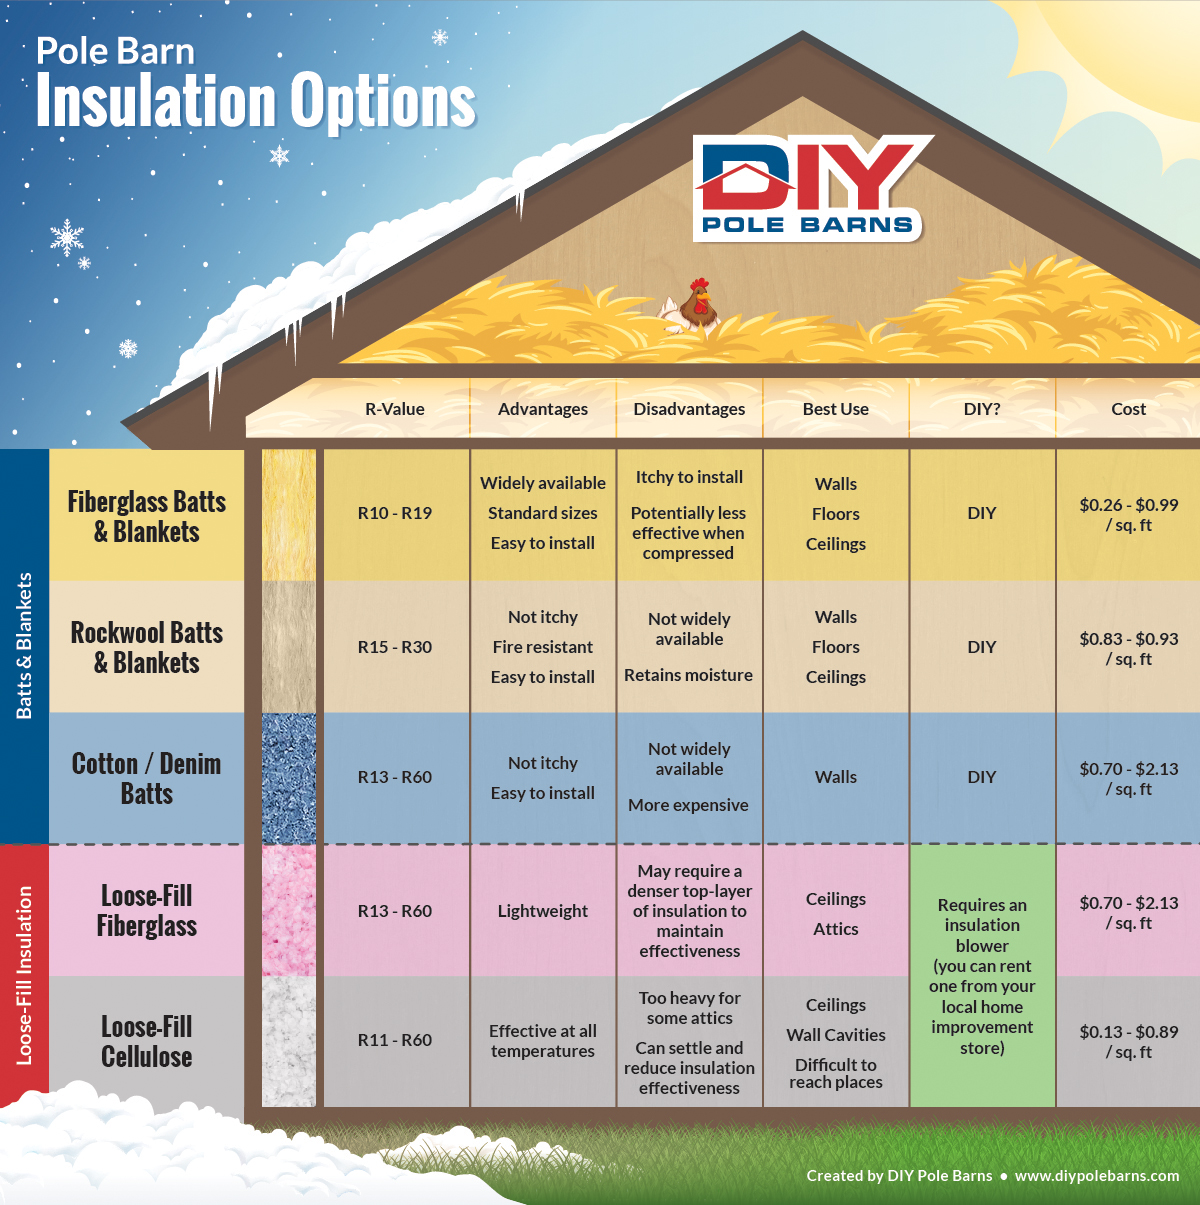 Pole Barn Insulation Options